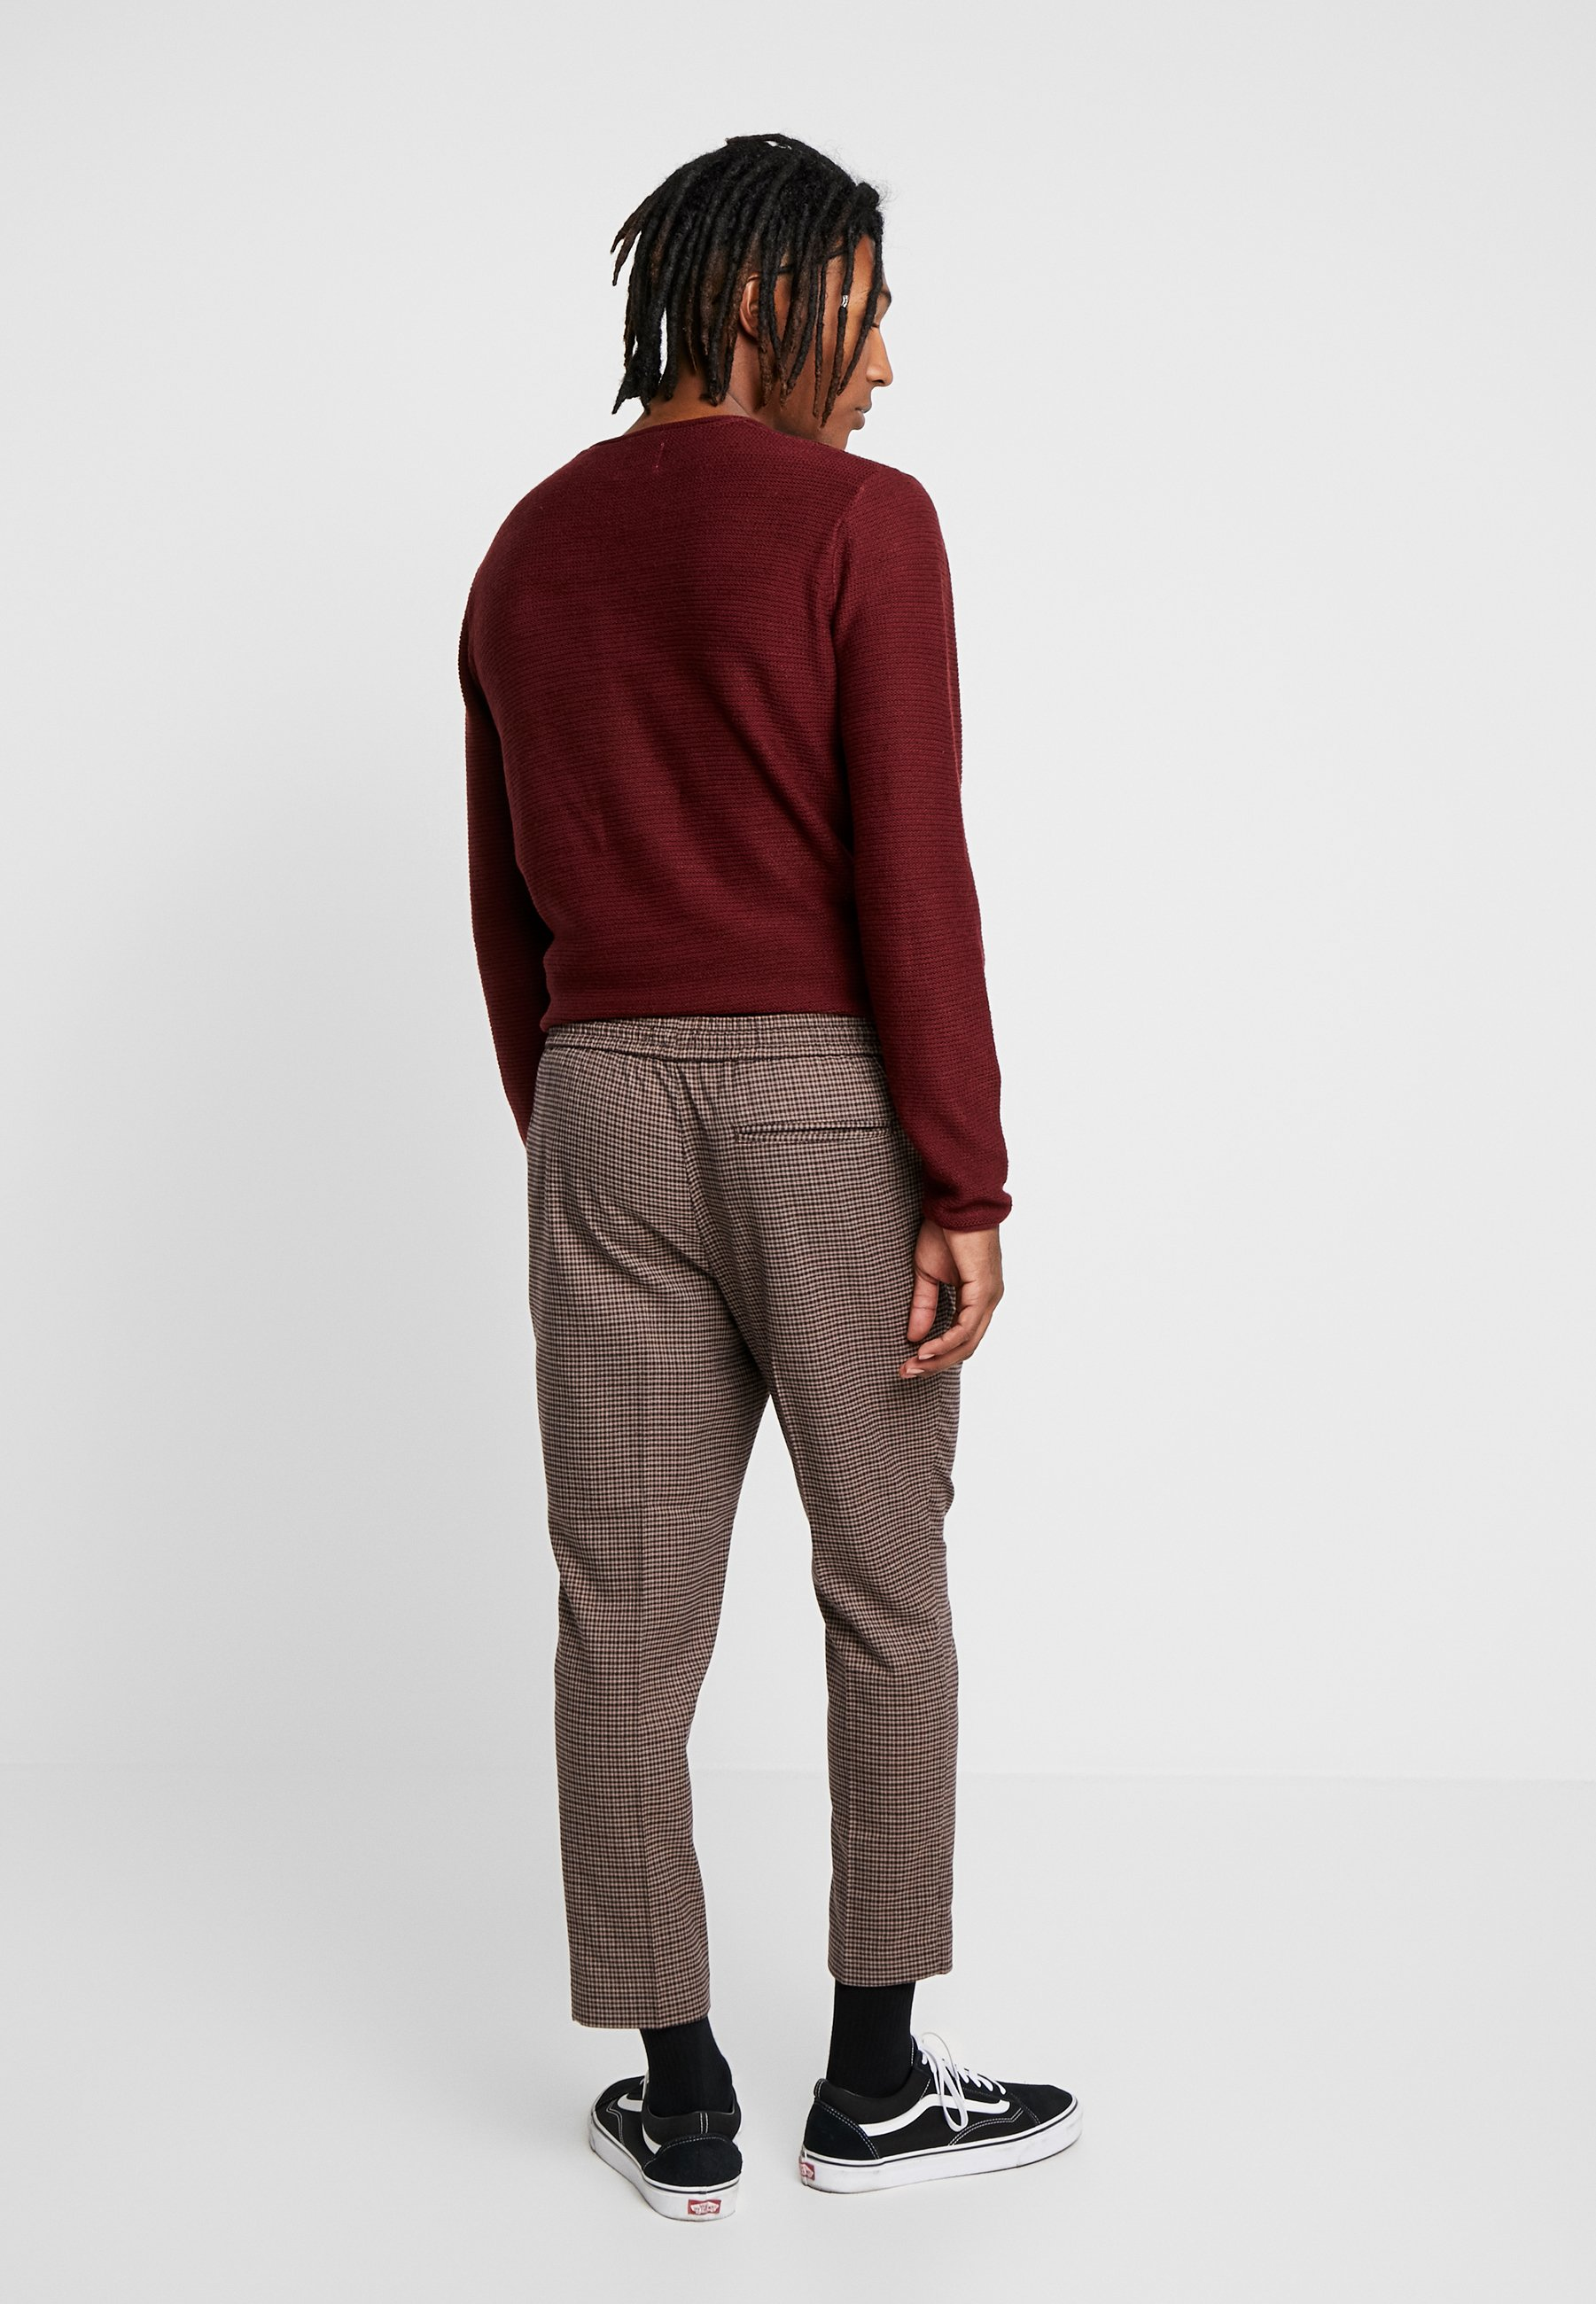 Look Brown Small Check Aso New Slim Classique CropPantalon bf6yvY7g